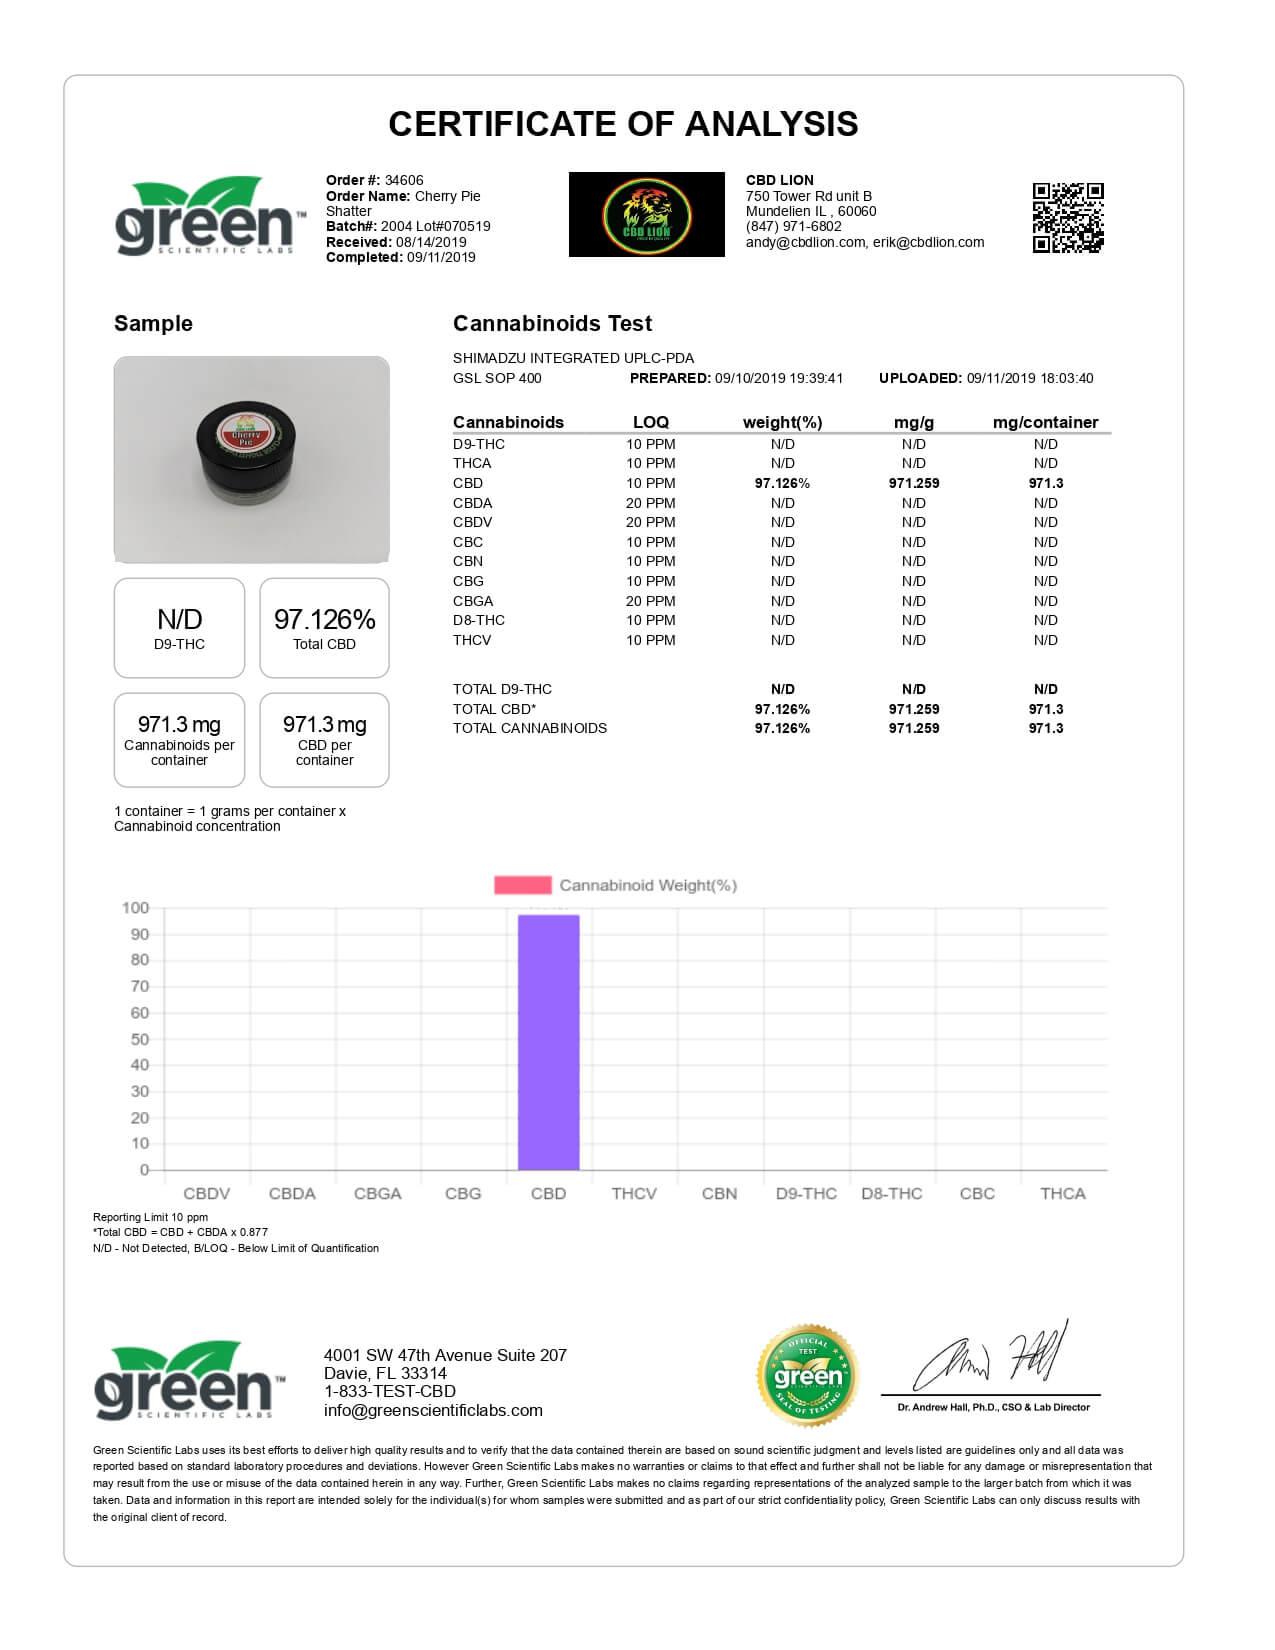 CBD Lion CBD Concentrate Cherry Pie Shatter 0.5g Lab Report